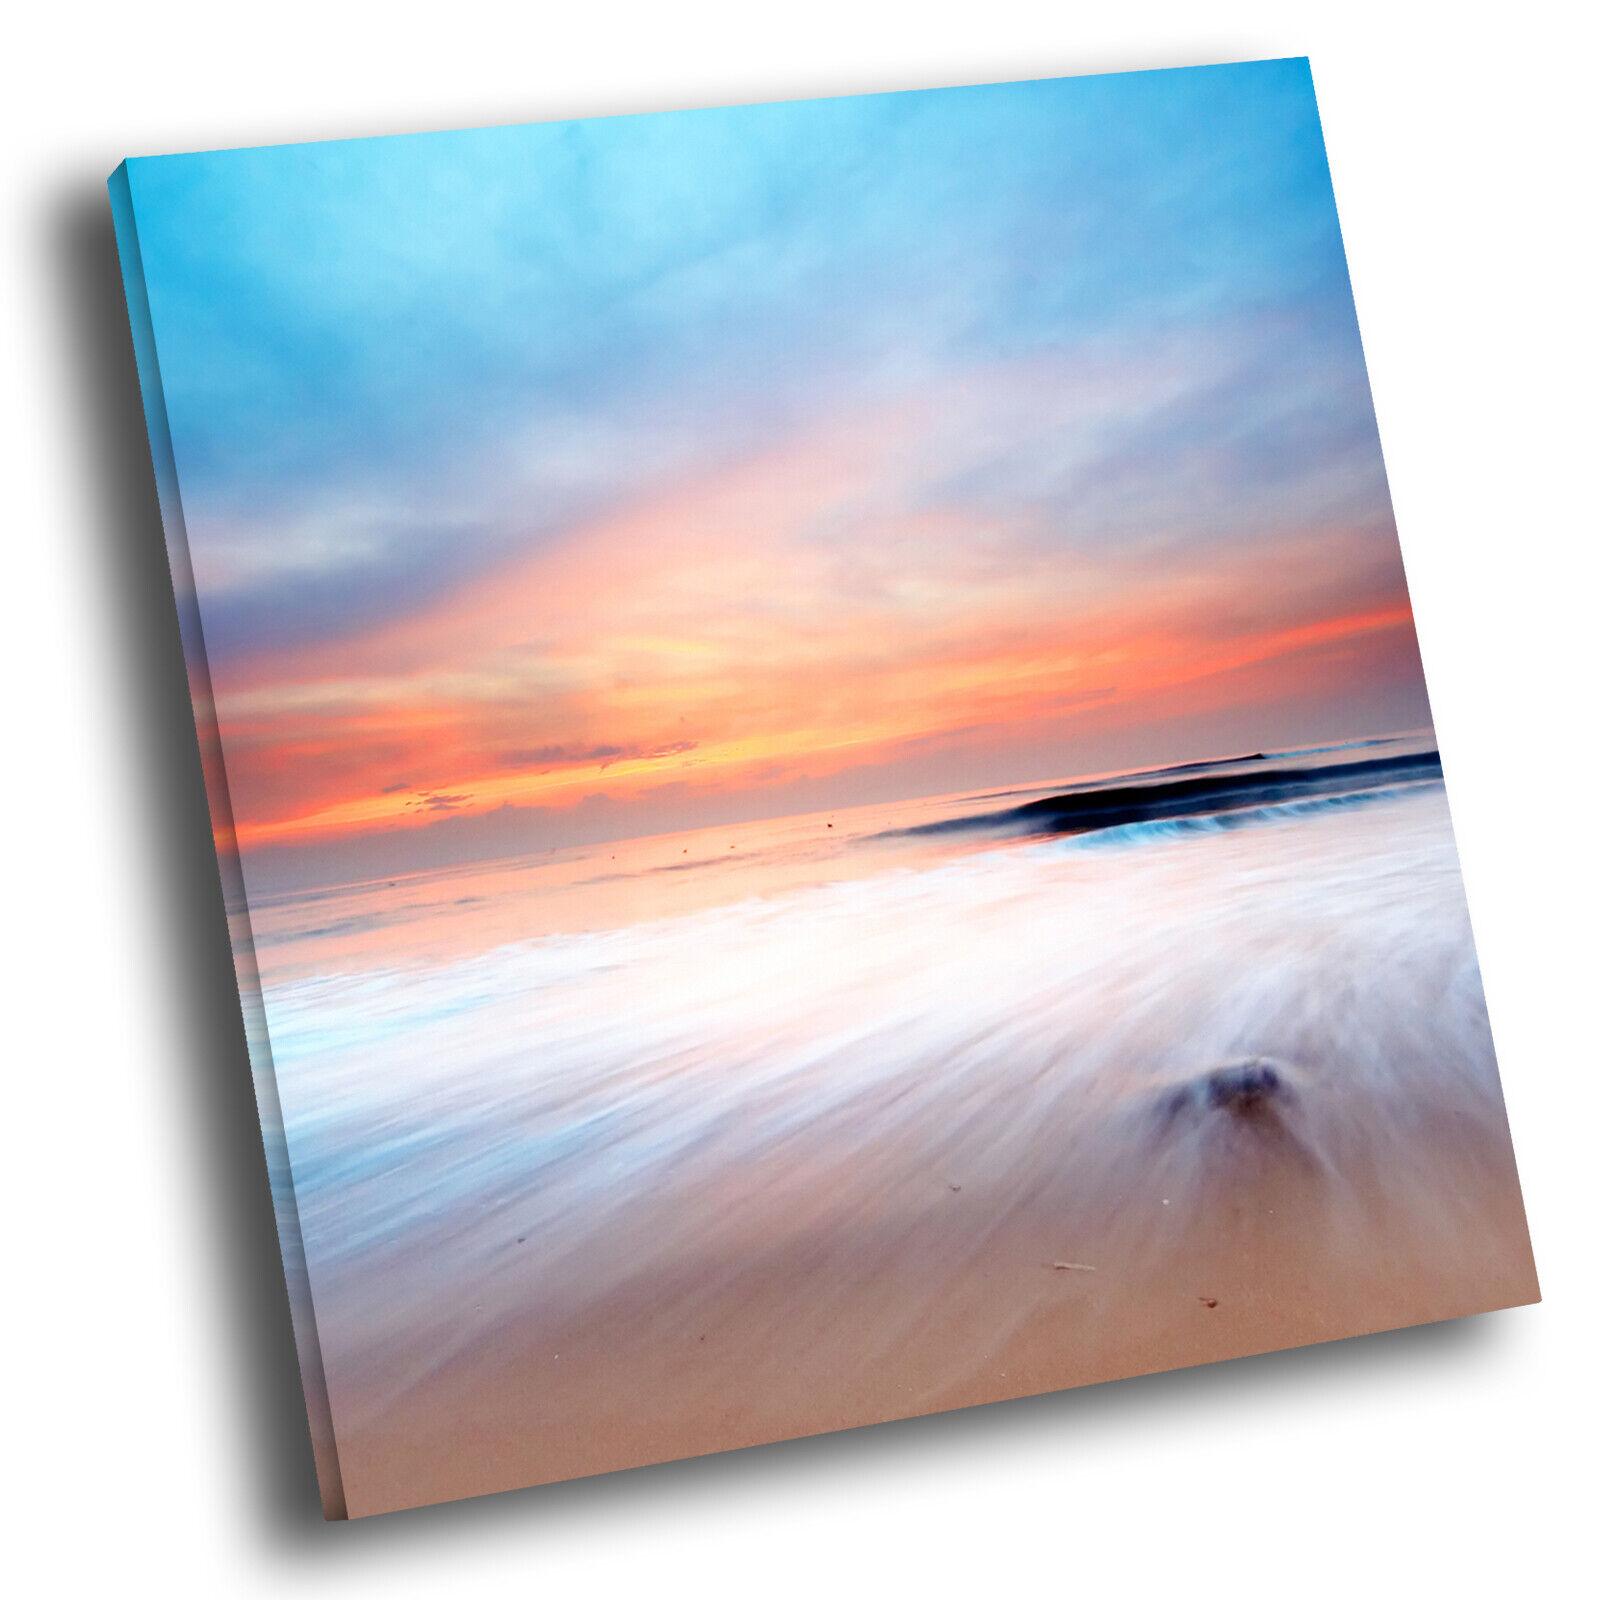 Blau Orange Weiß Beach Cool Square Scenic Canvas Wall Art Large Picture Print